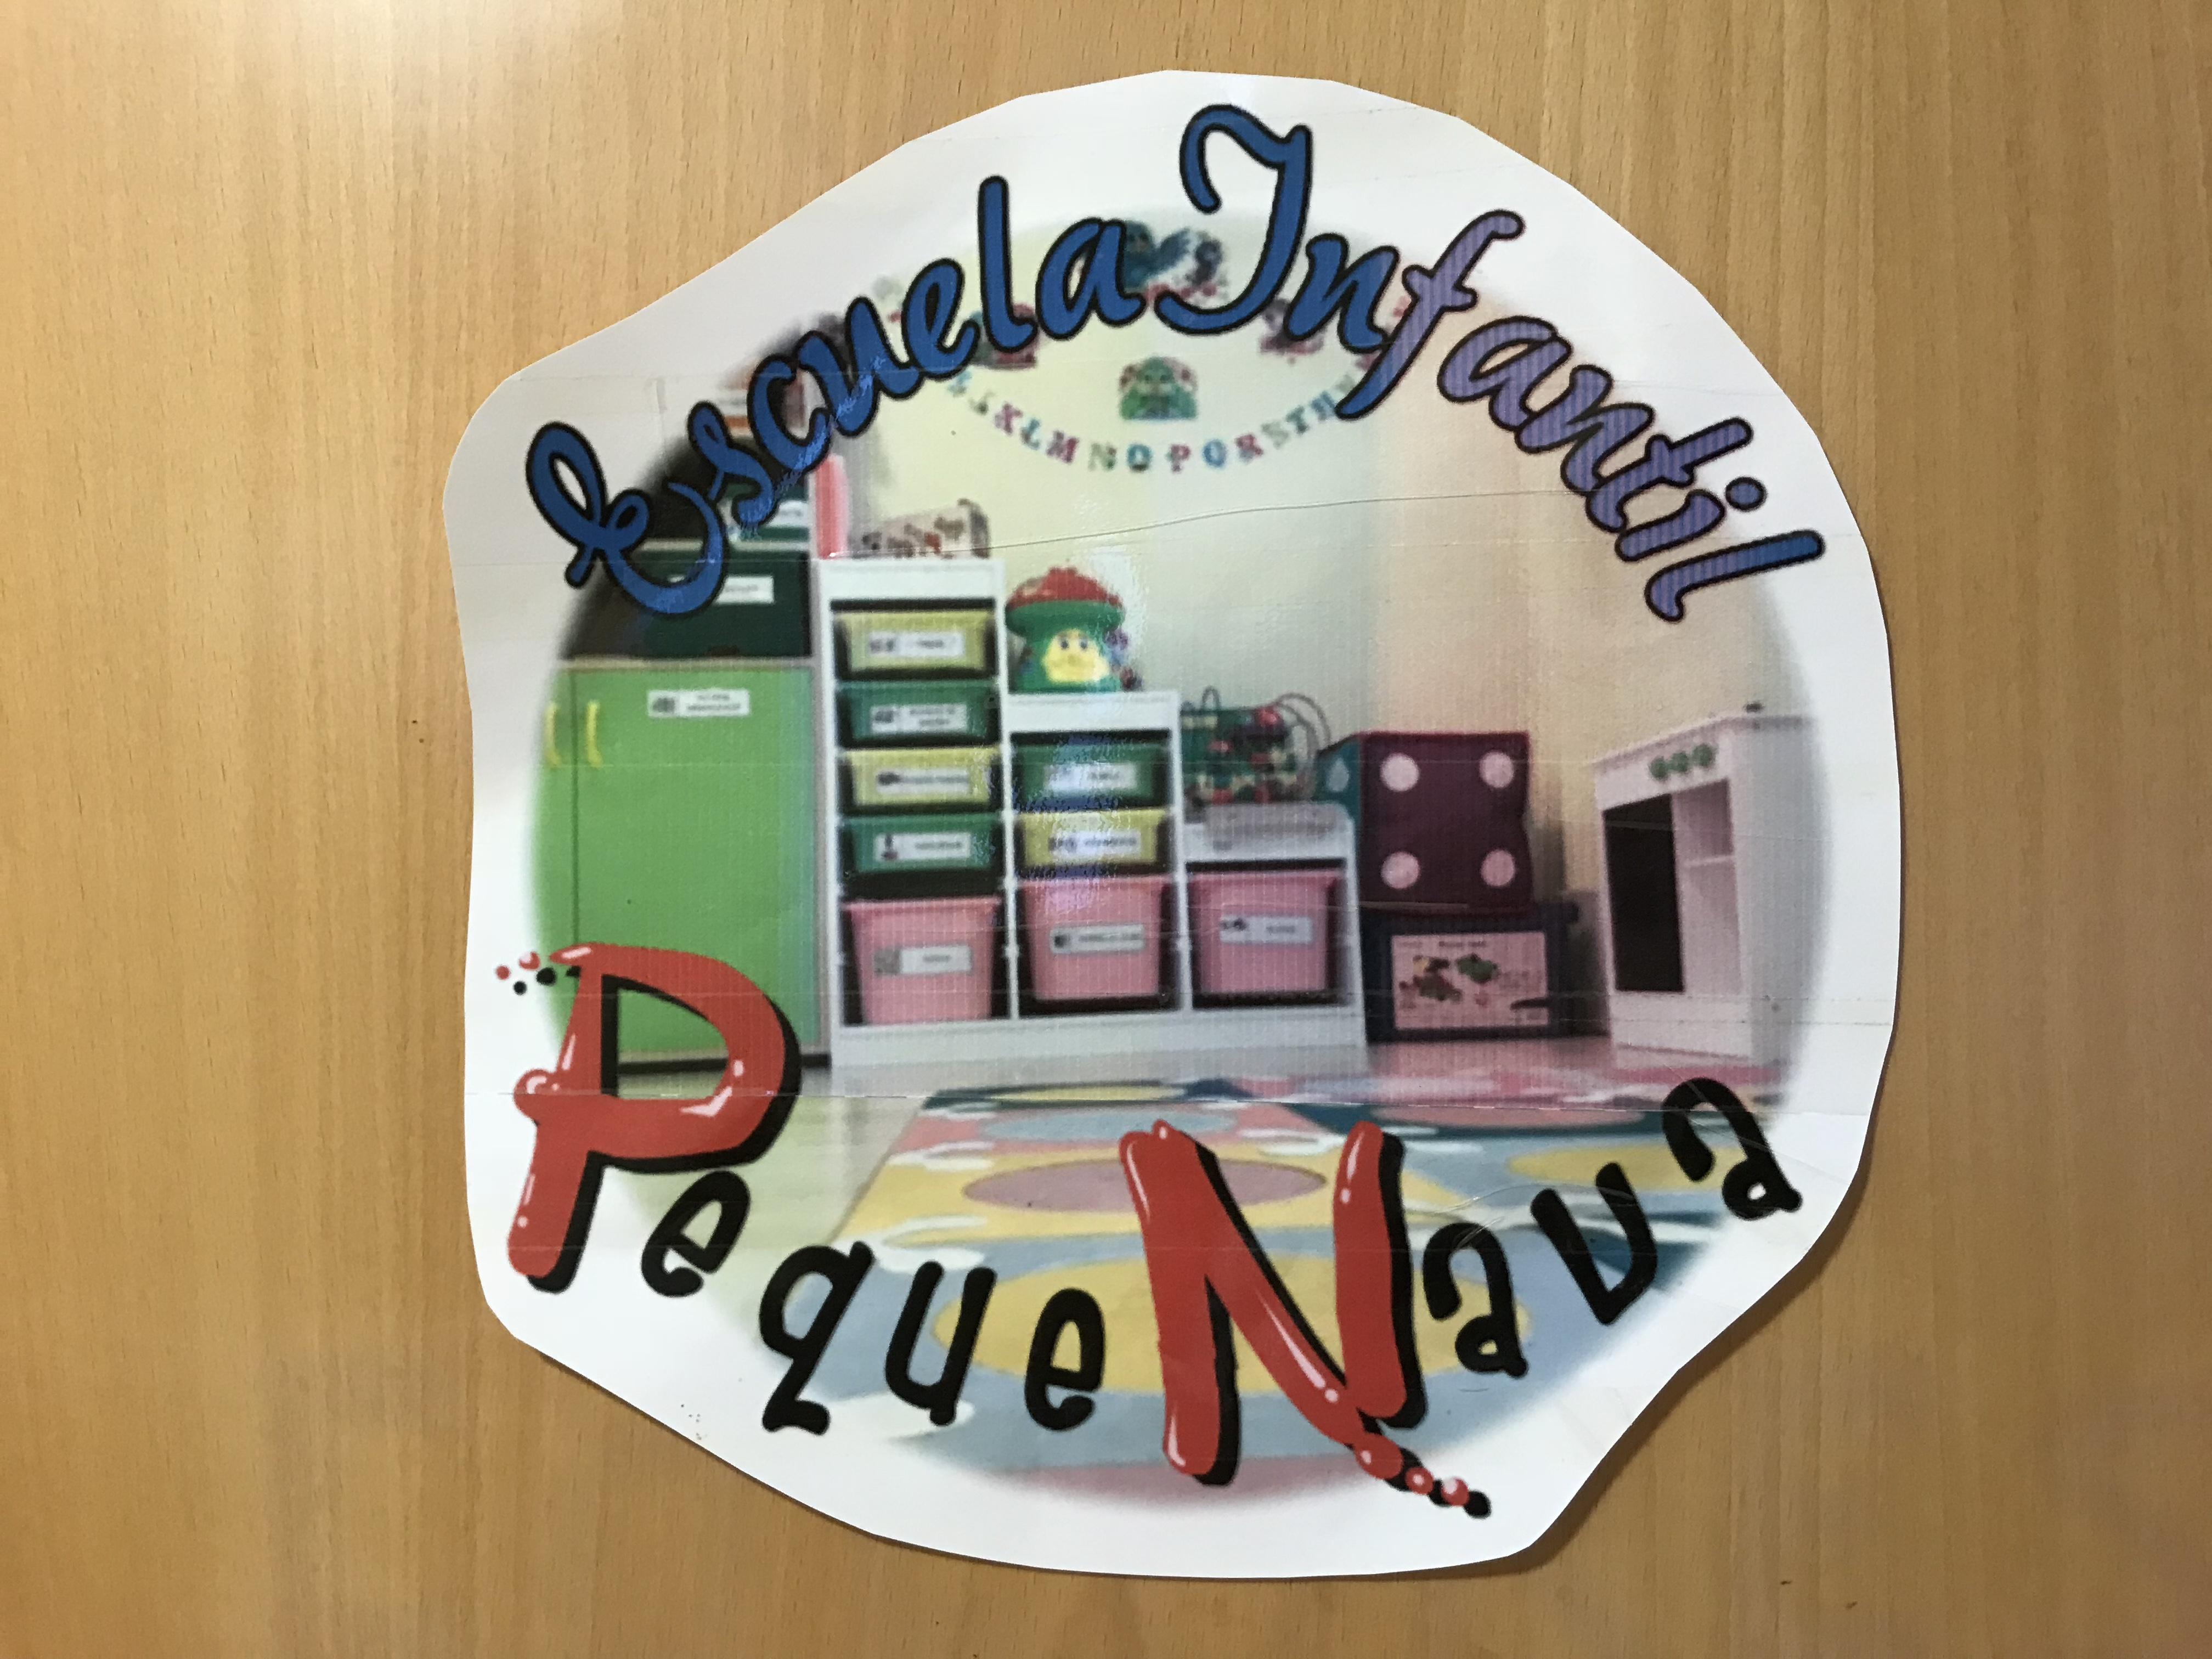 AMPLIACIÓN DE HORARIO – Escuela Infantil Peque Nava